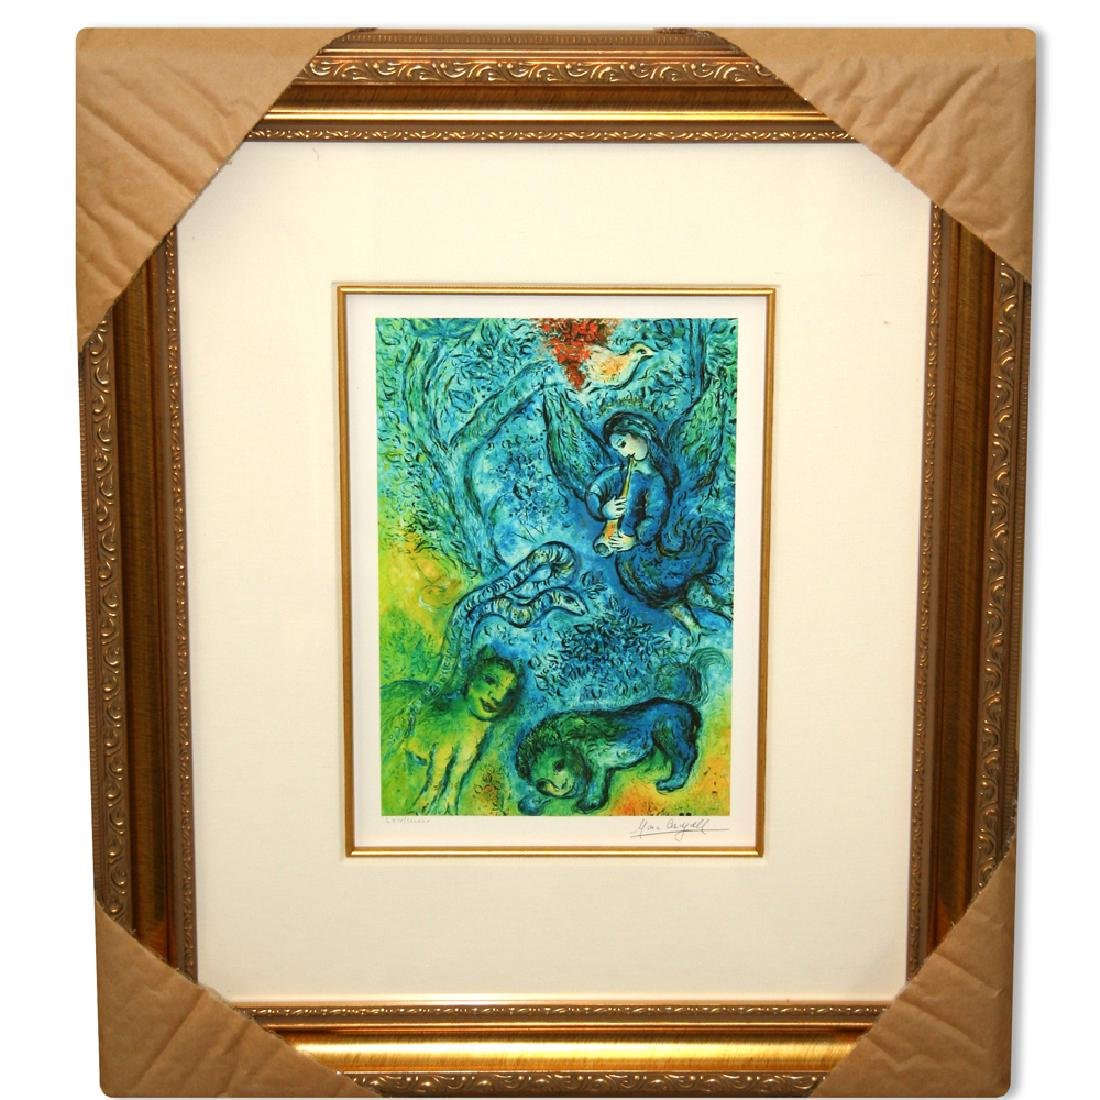 Chagall (After) 'Magic Flute' Museum Framed Giclee-Ltd